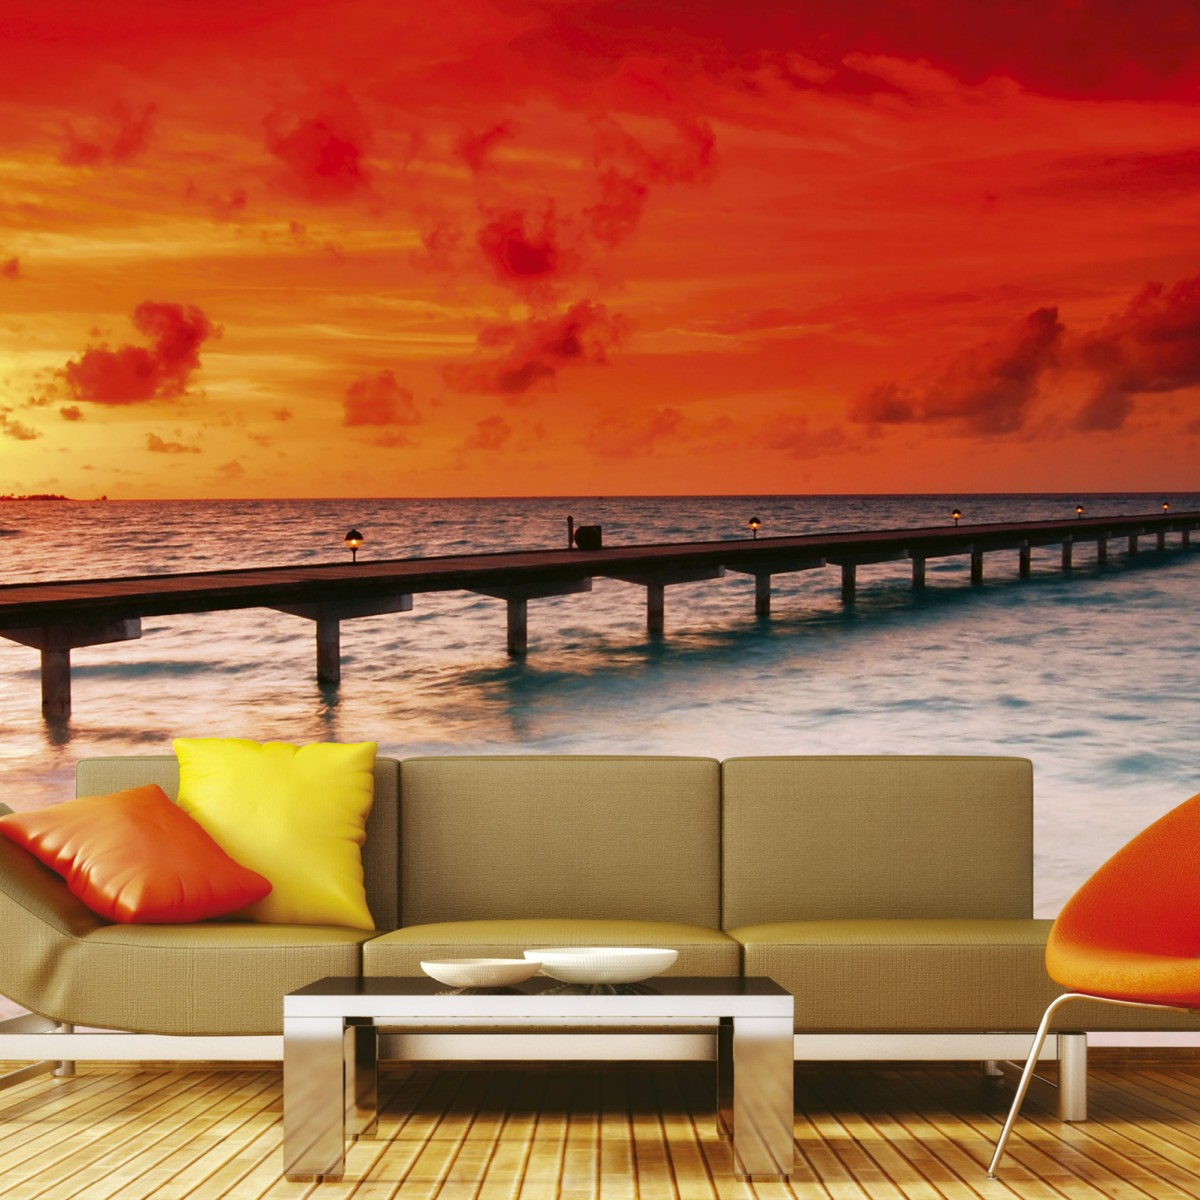 Foto tapet 3D Jetty In Sunset, Dimex, 5 fâșii, 375 x 250cm